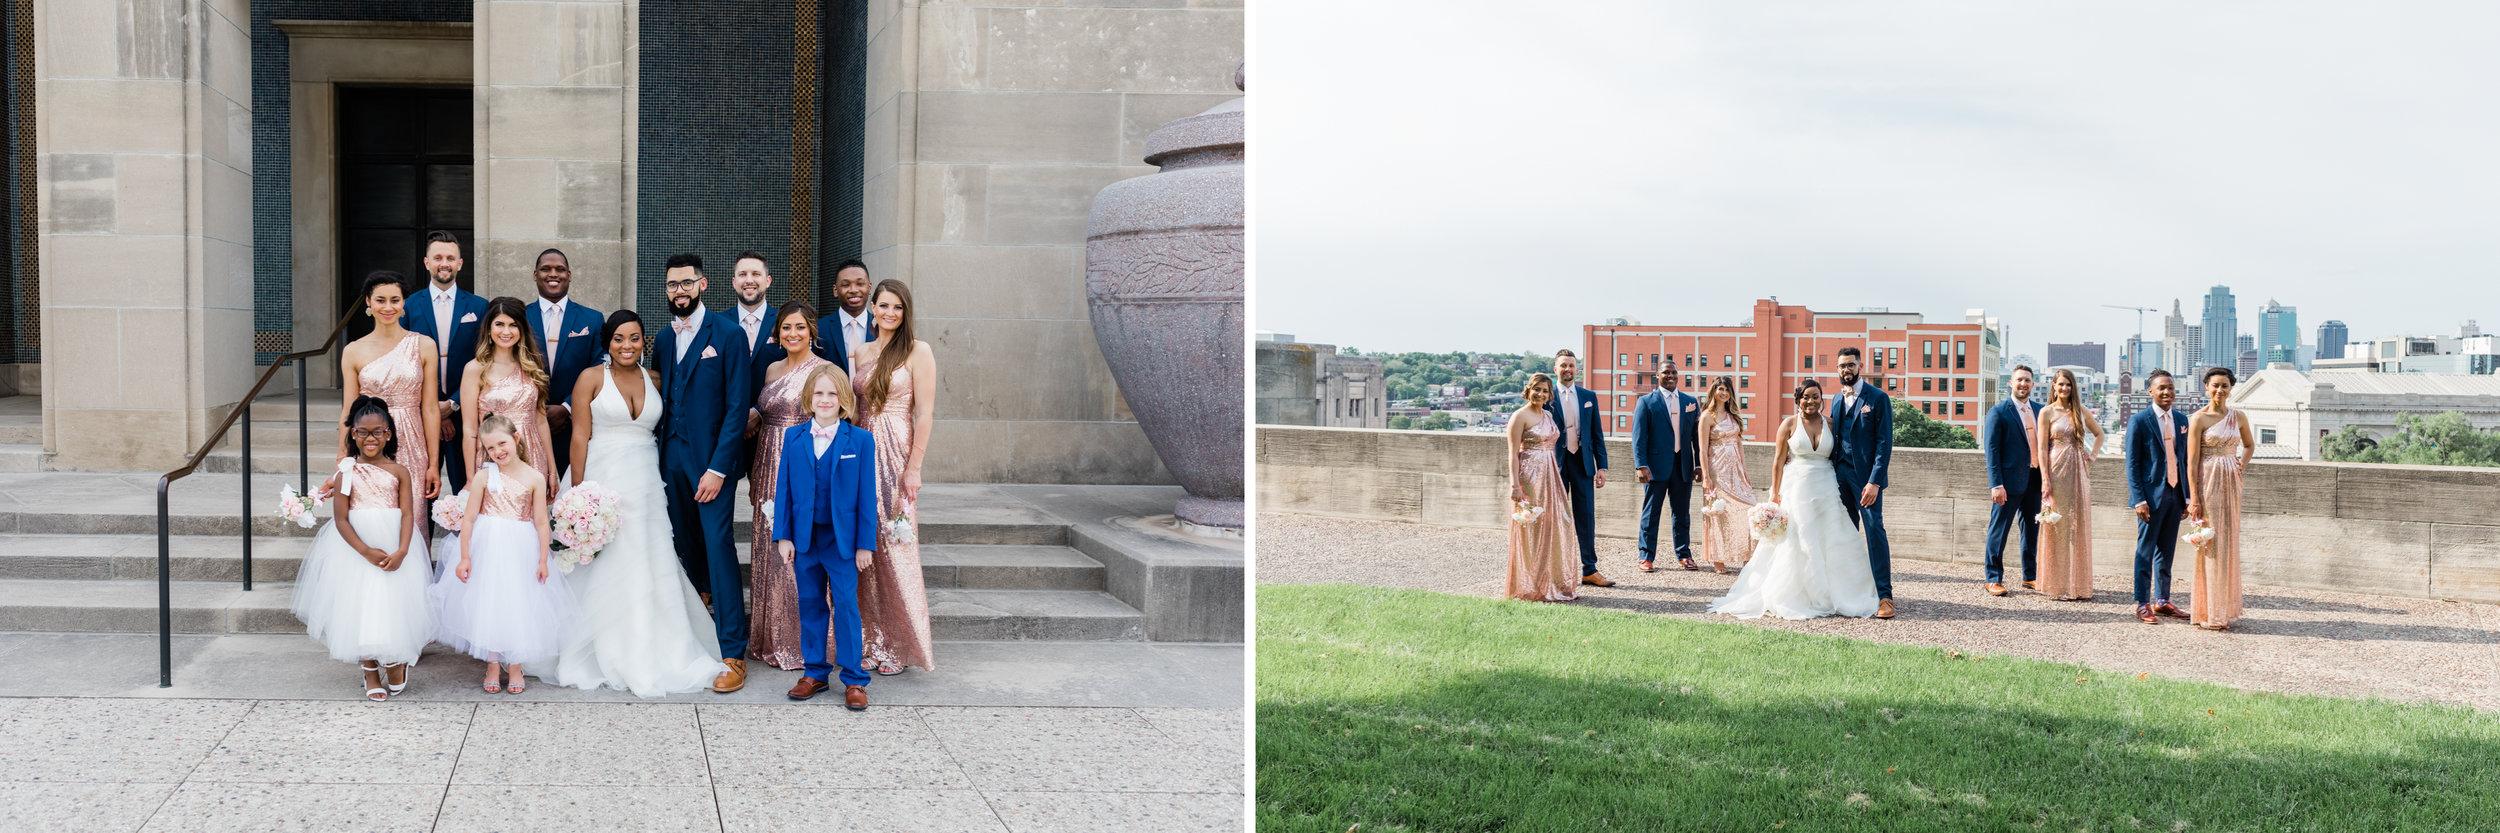 Kansas City Wedding Photographer 58.jpg